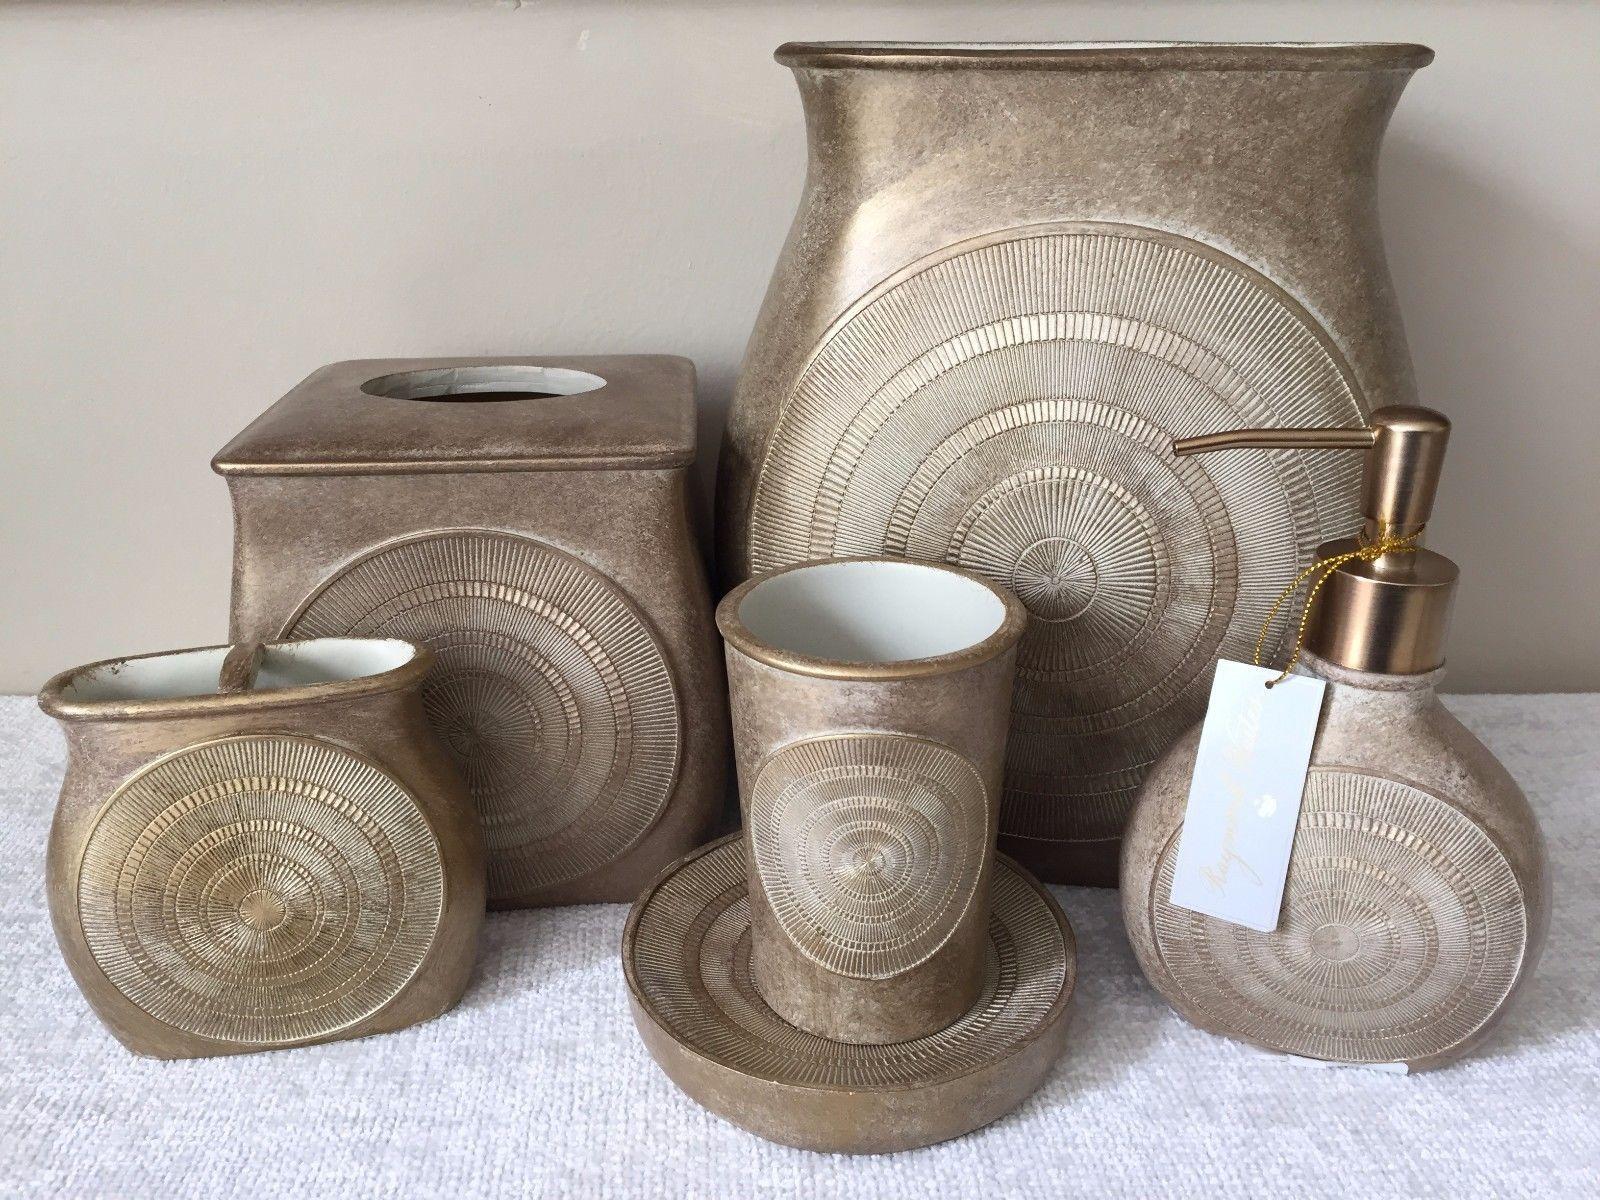 Gold bathroom sets - Bath Accessory Sets 176990 Raymond Waites Gold Bathroom Set Dispenser Toothbrush Wastebasket Soap More